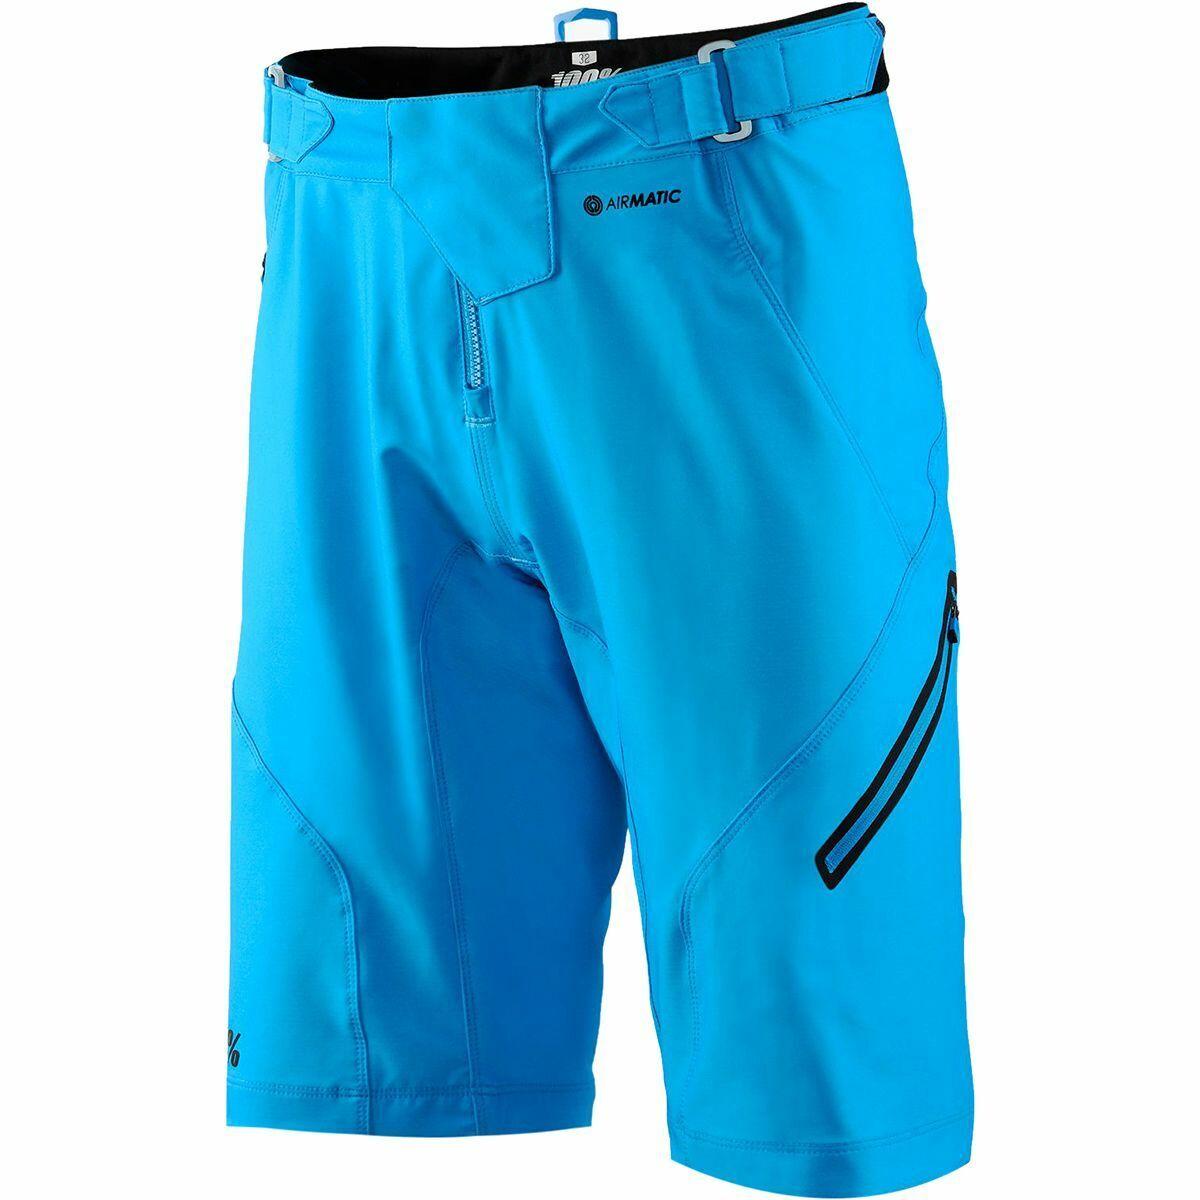 100% Airmatic Short bluee - 28